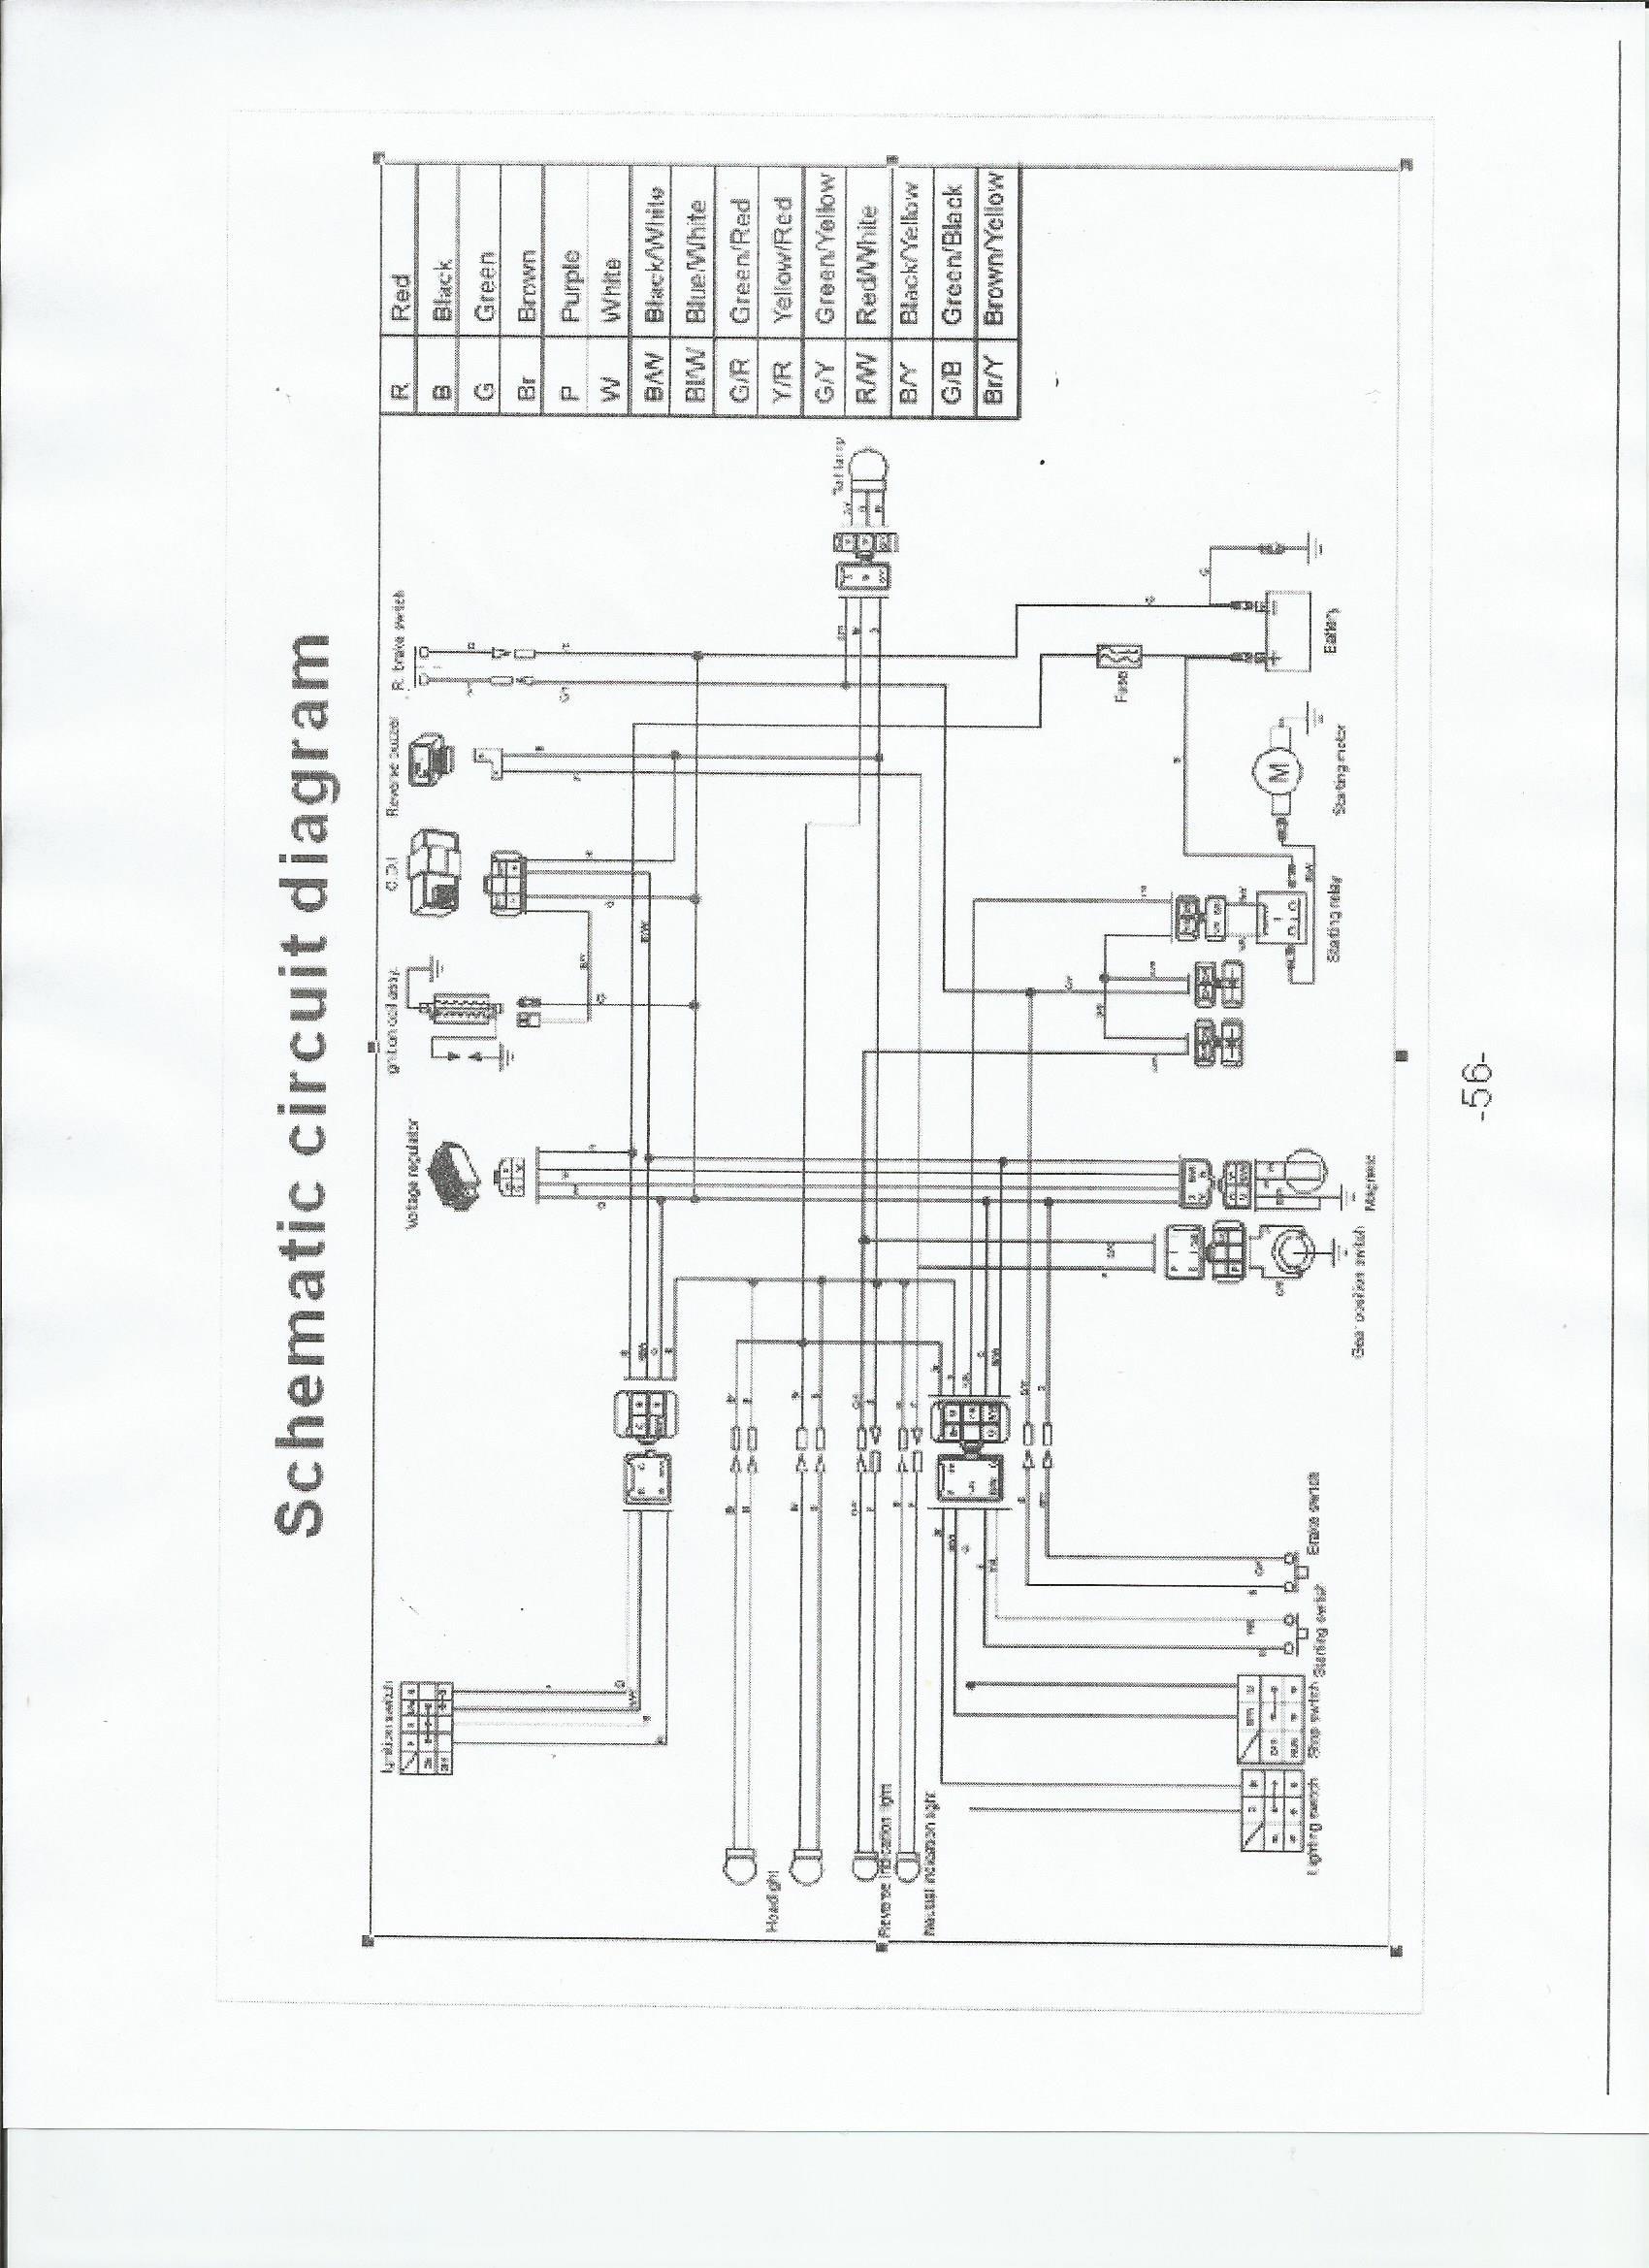 Tremendous Honda Trx450Es Wiring Diagram 2000 Honda Trx450Es Wiring Diagram Wiring 101 Archstreekradiomeanderfmnl